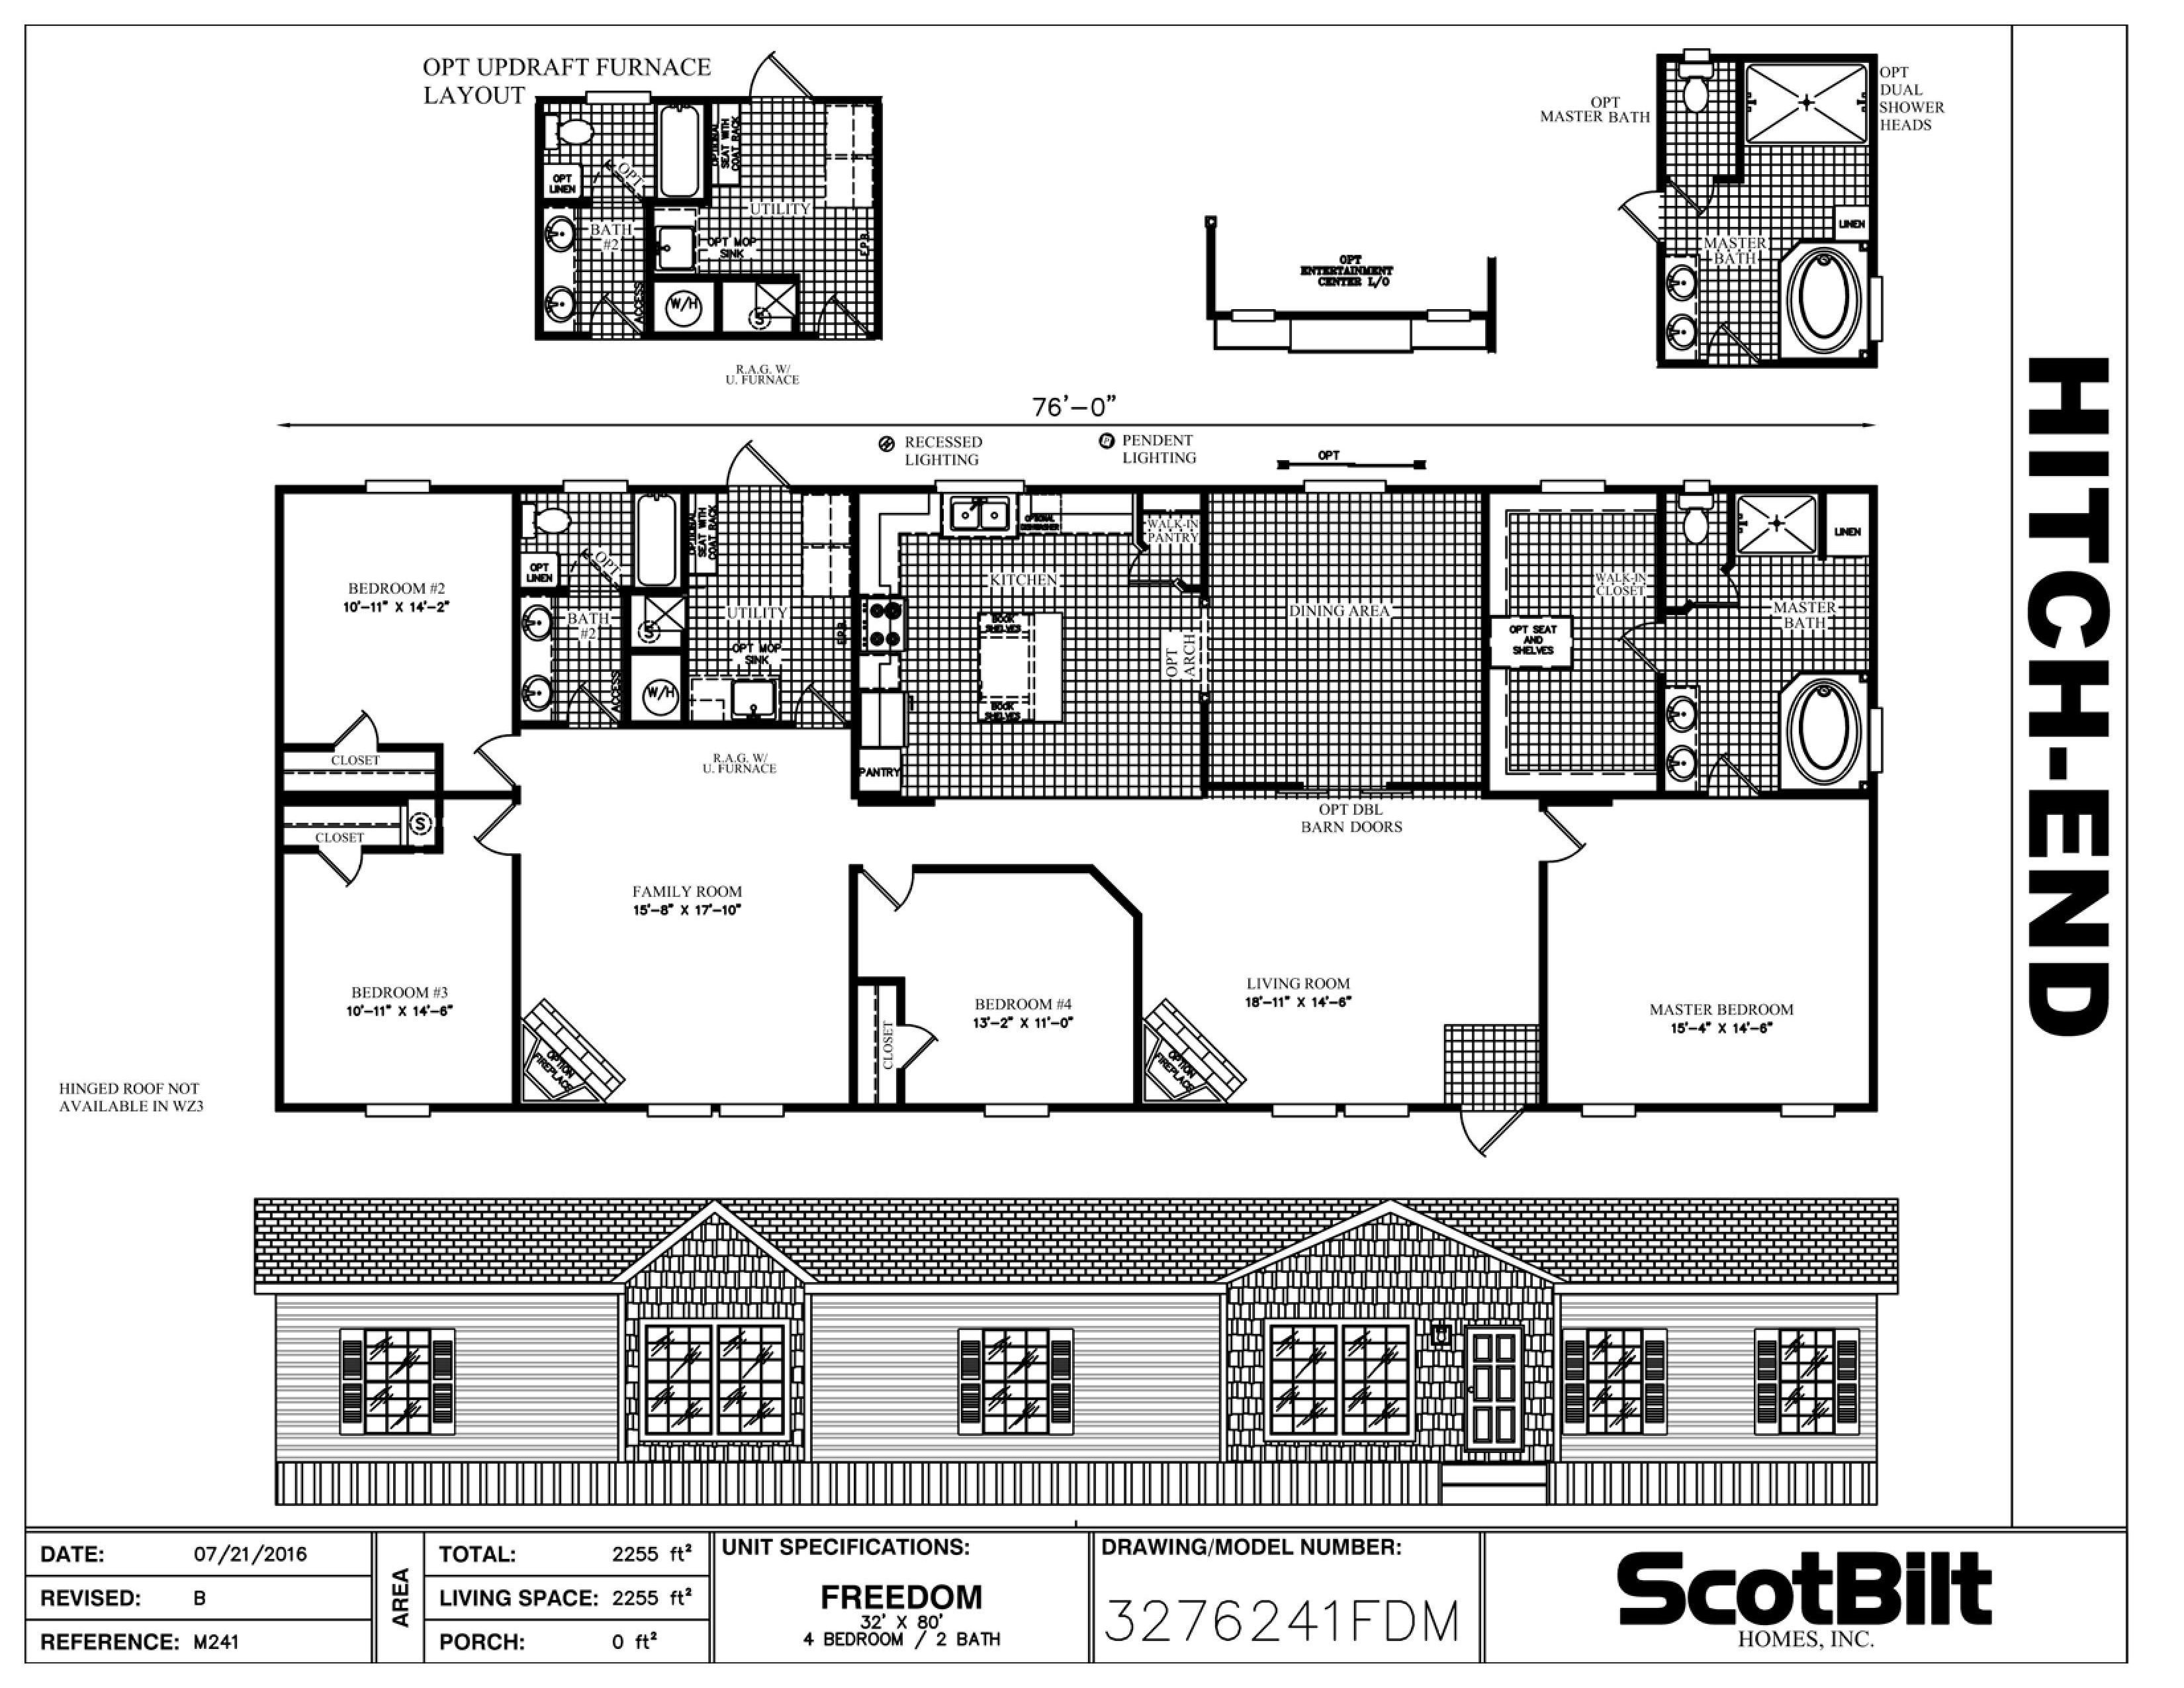 The Maverick Floorplan